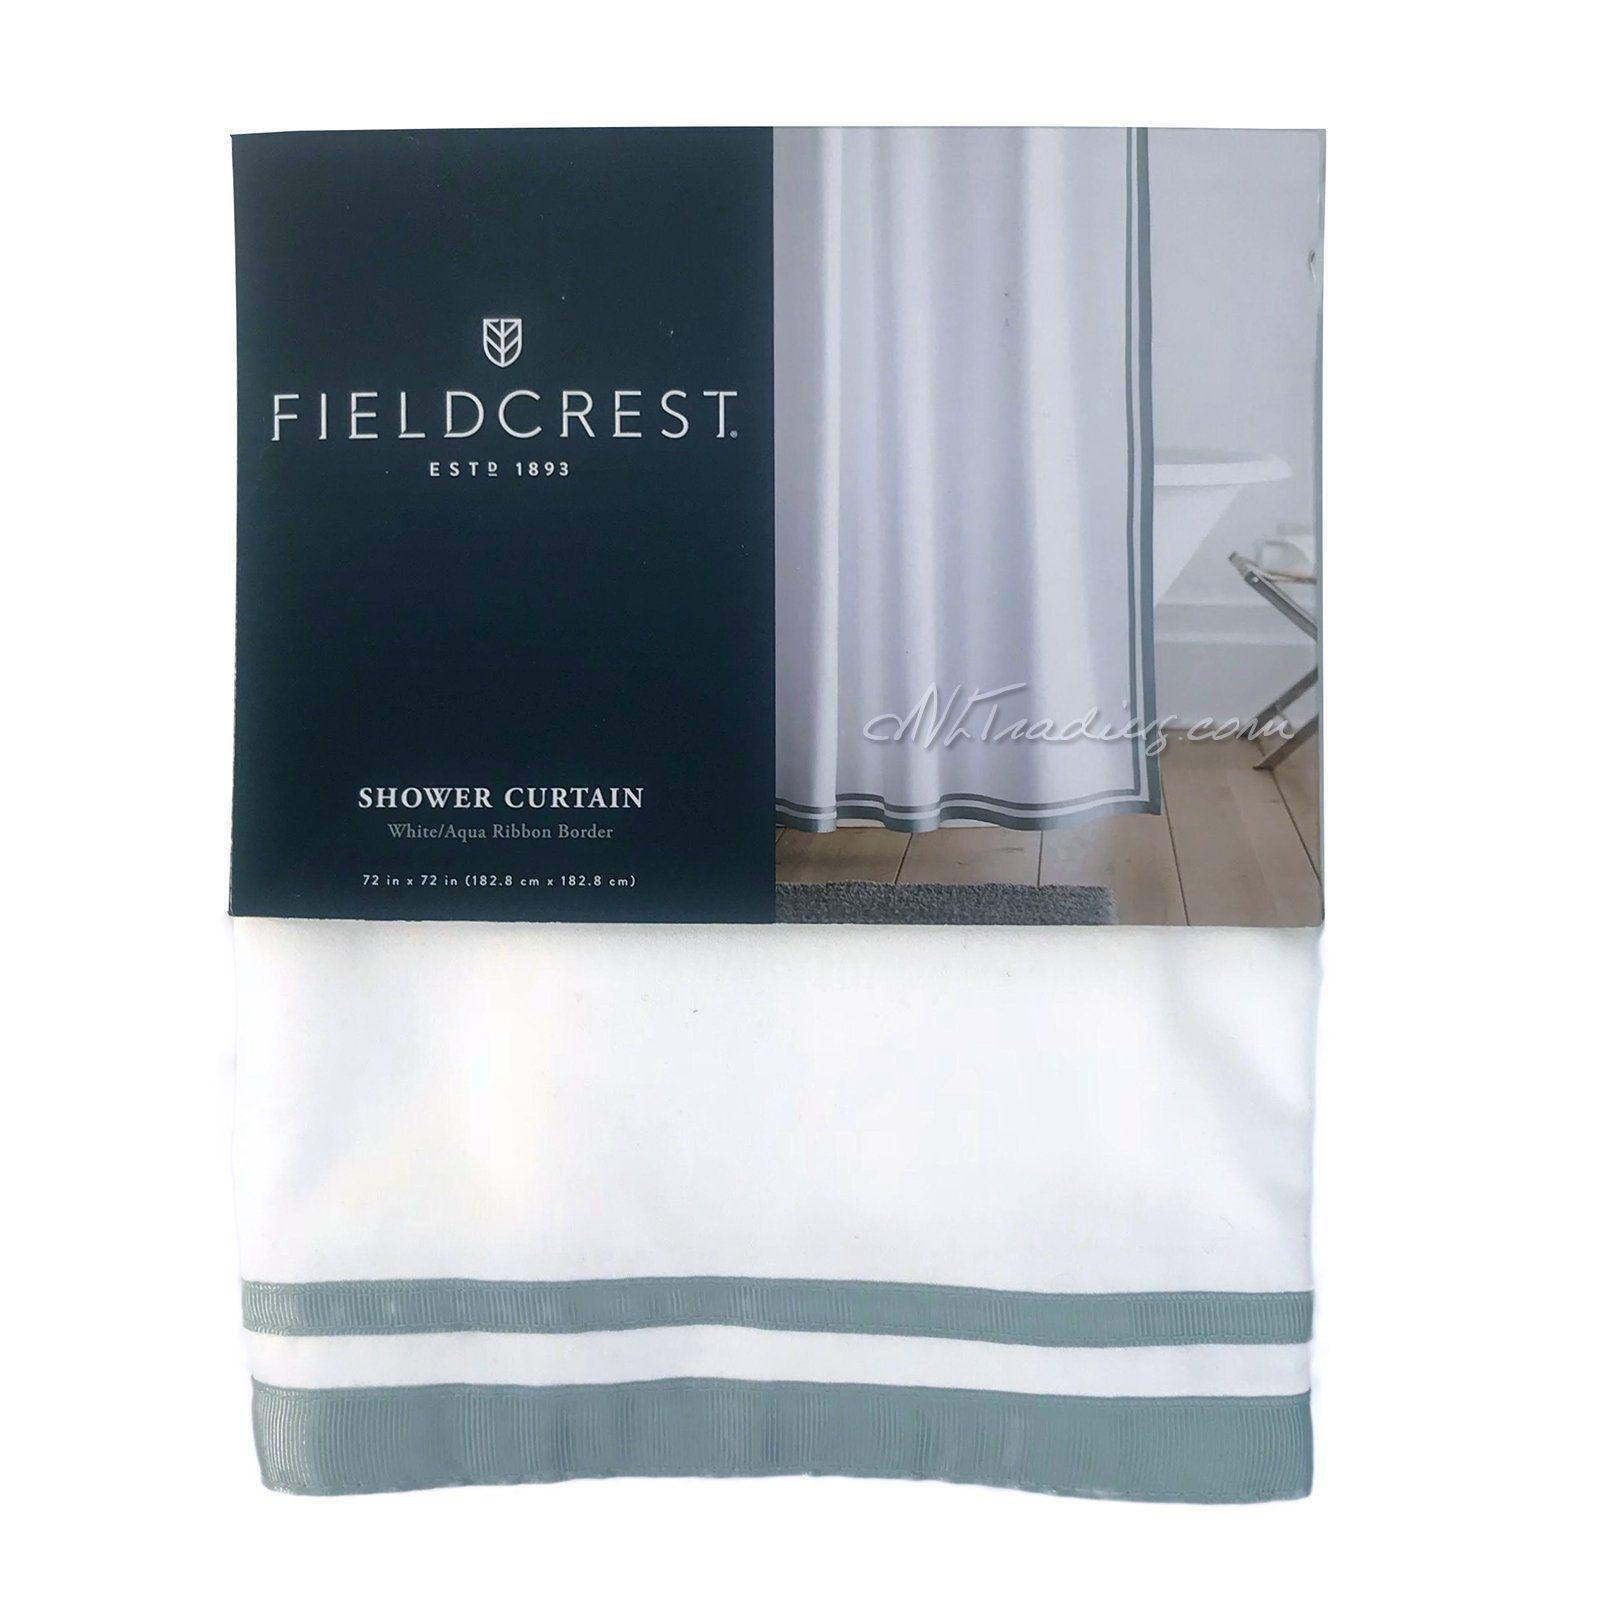 White Aqua Ribbon Border Shower Curtain